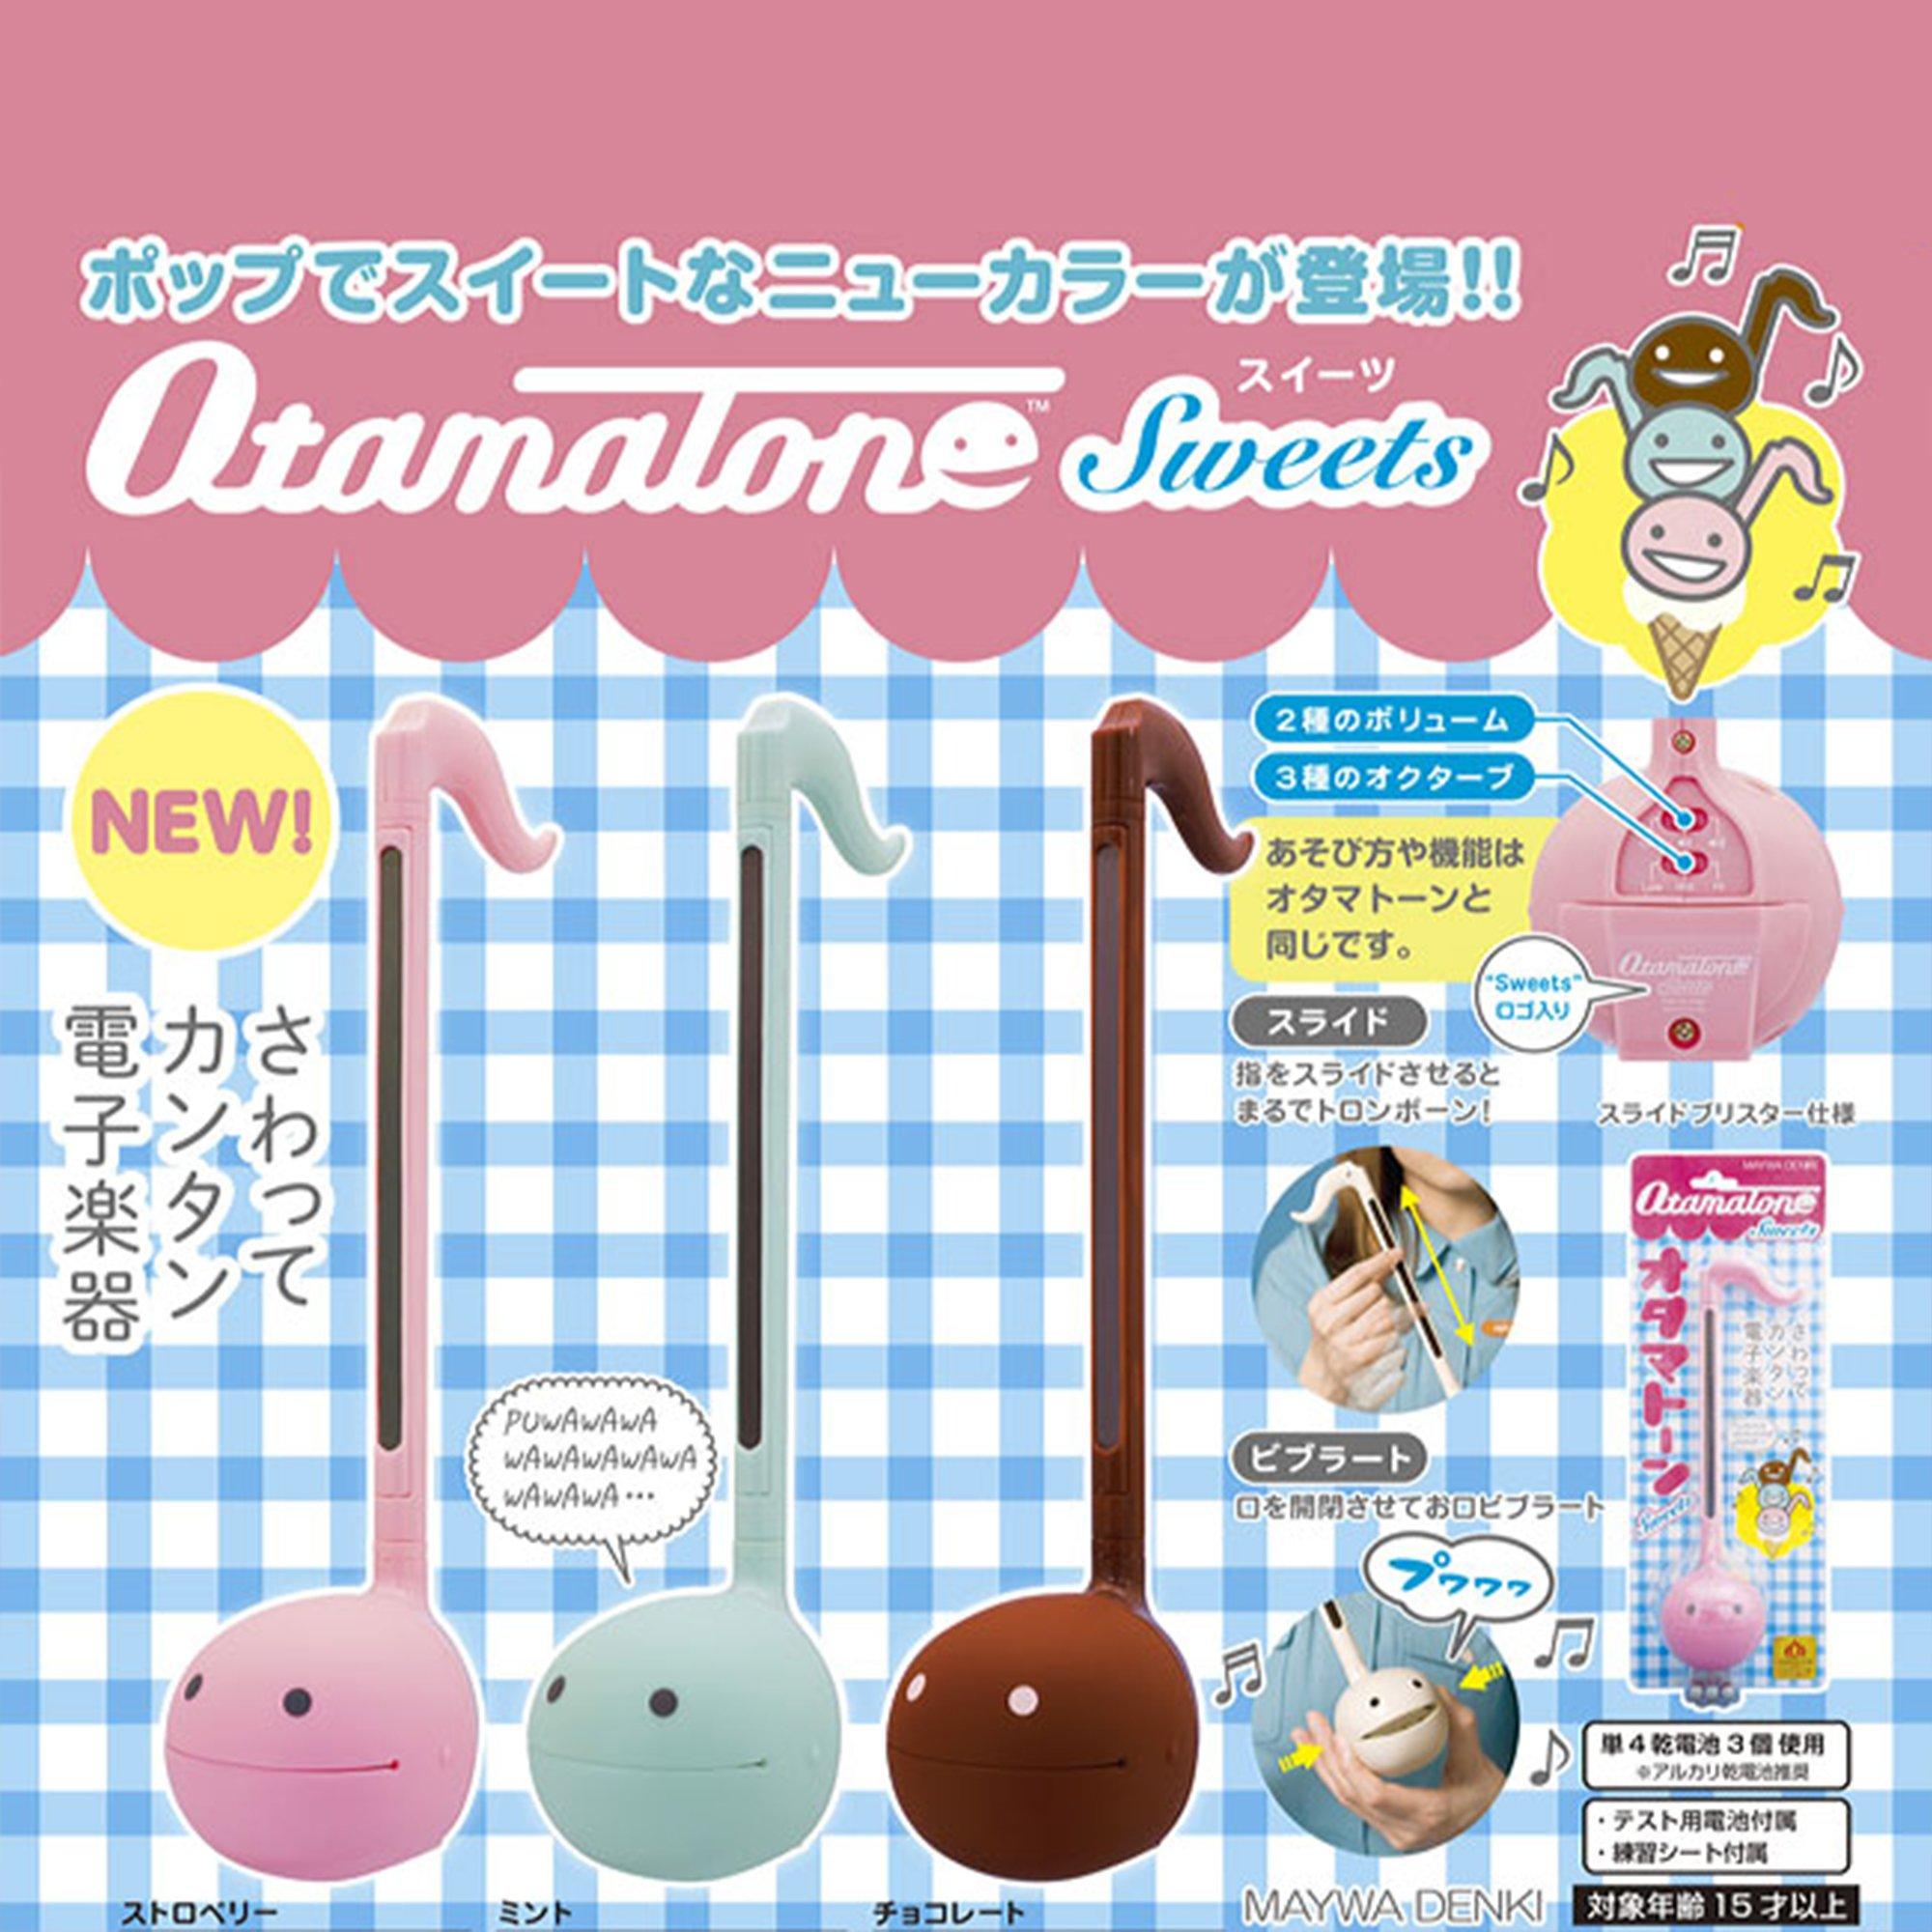 Otamatone [Sweets Series] ''Berry'' [Japanese Edition] Japanese Electronic Musical Instrument Synthesizer by Cube / Maywa Denki from Japan, Strawberry Pink by Otamatone     (Image #8)